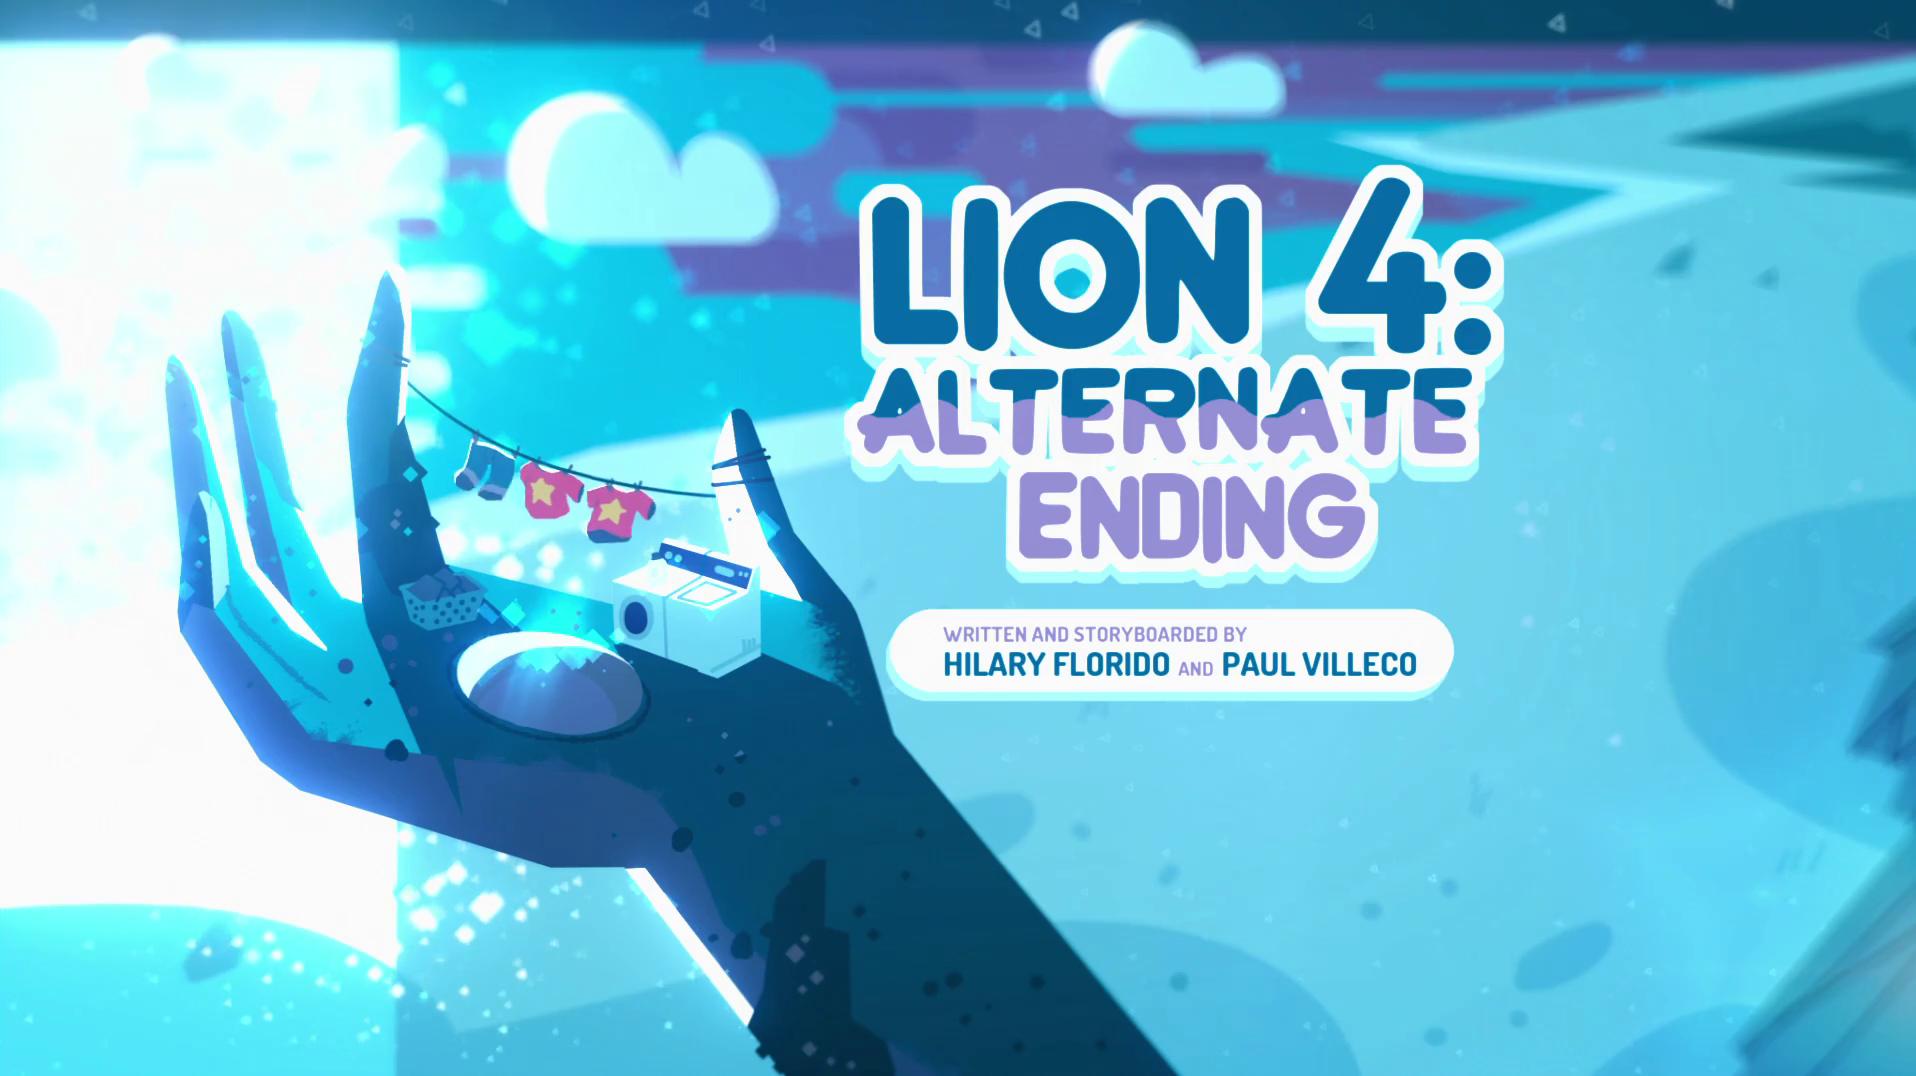 Steven Universo - Leão 4: Final Alternativo